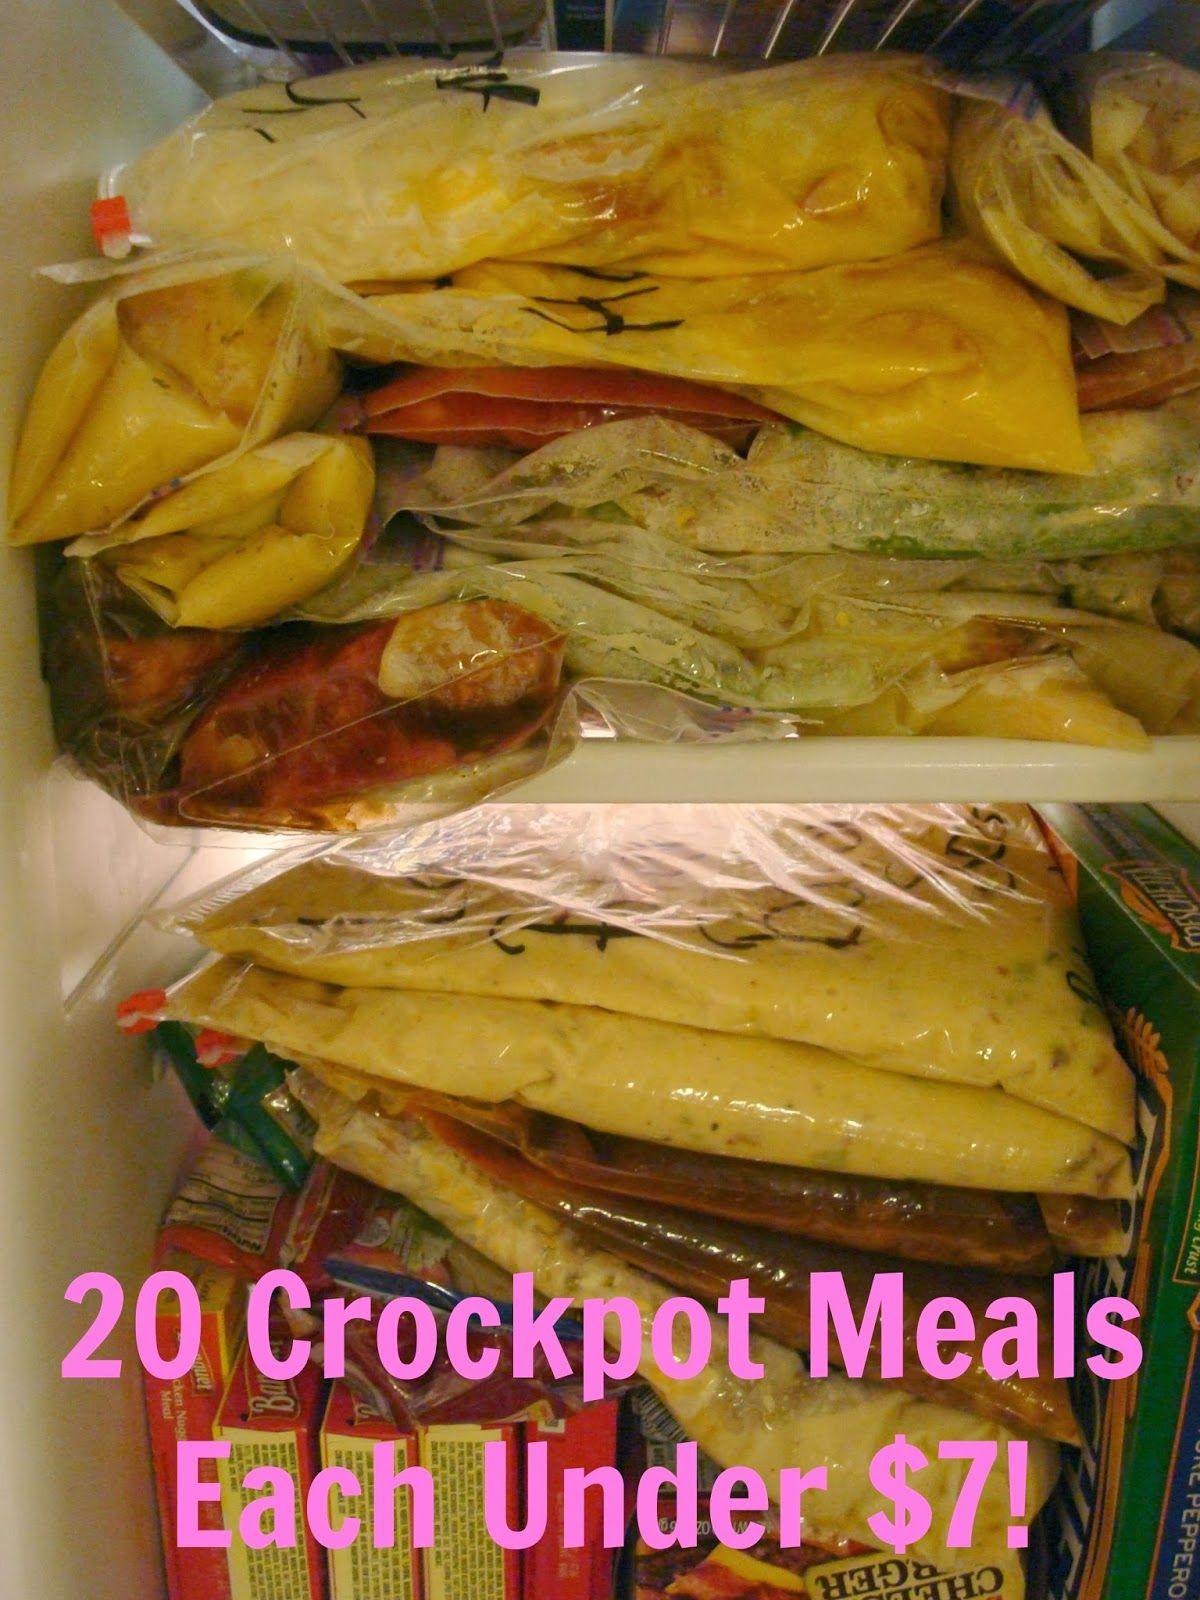 20 Crockpot meals